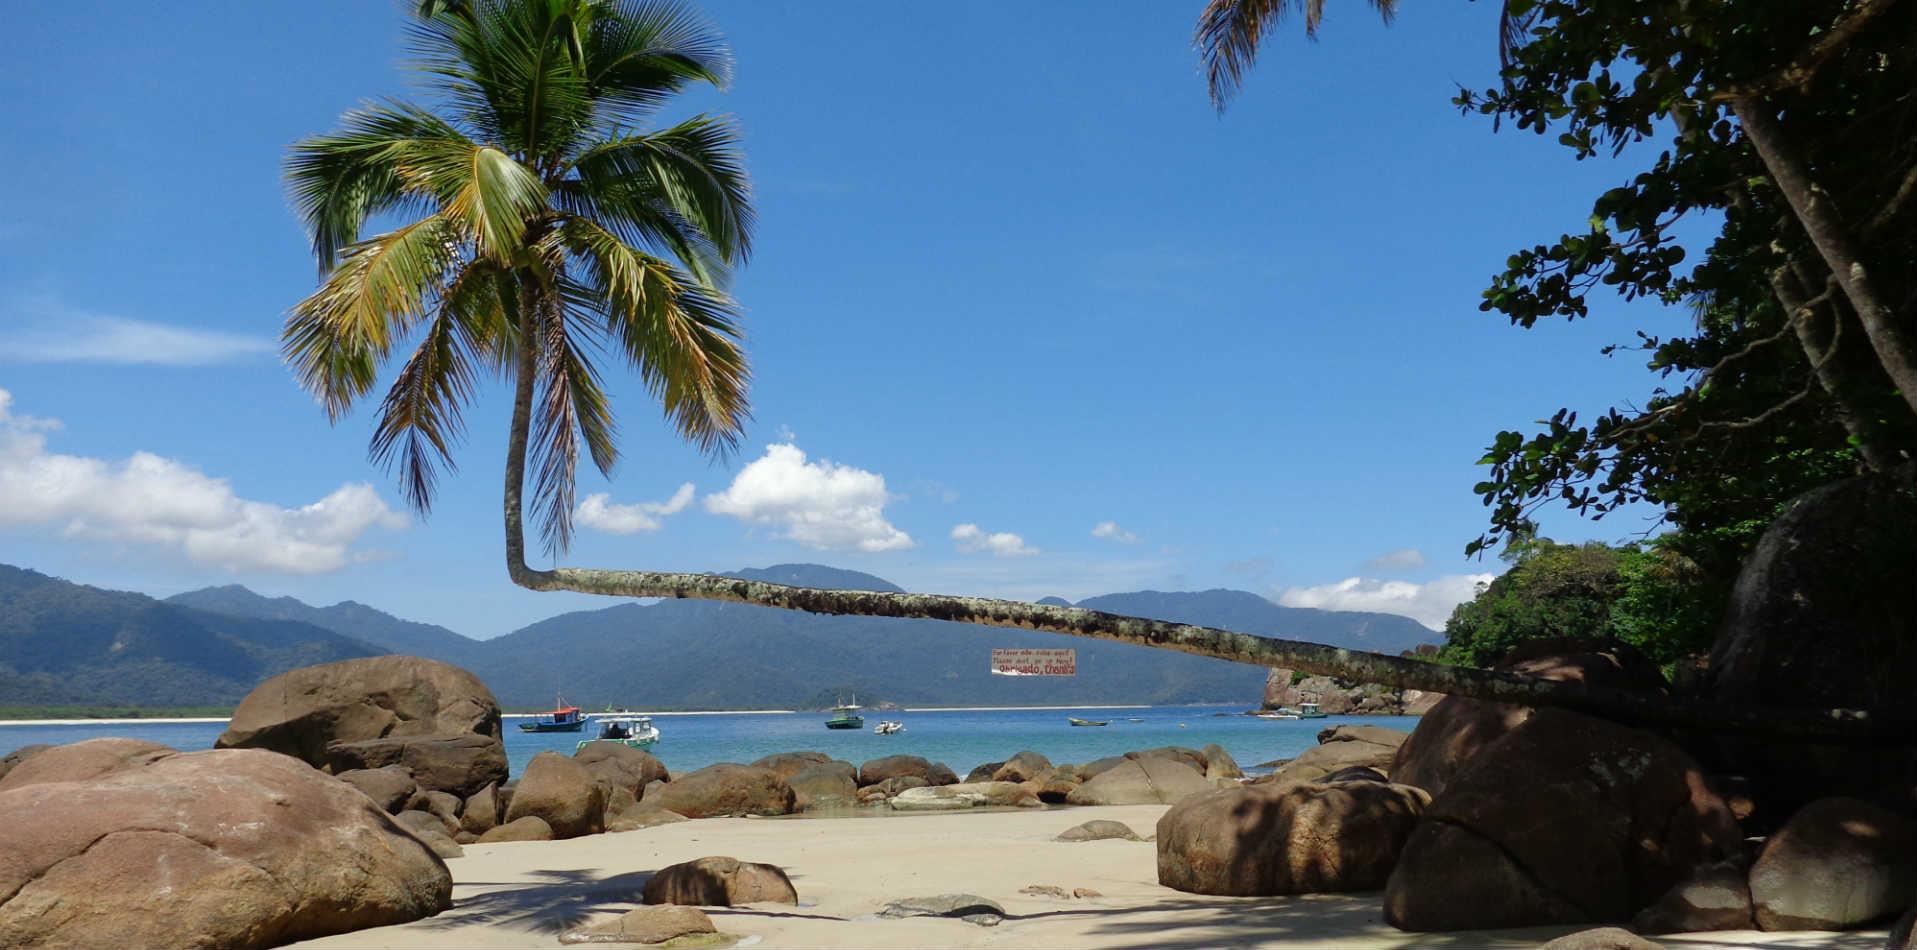 ilha grande - Praia do aventureiro